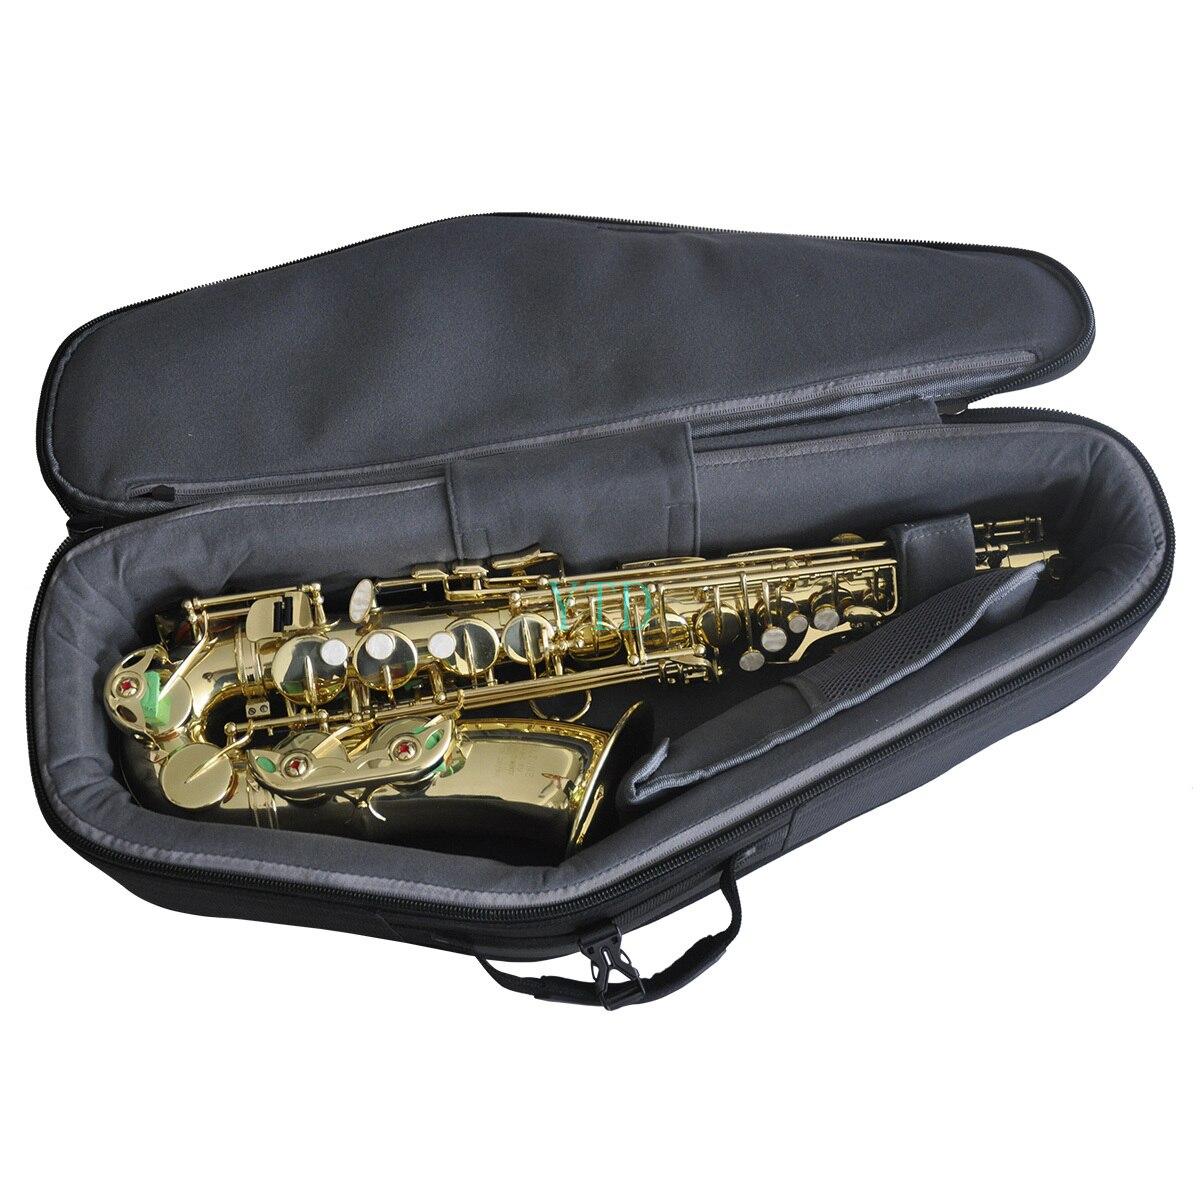 Down E-tone Mid-saxophone Box, High-quality Saxophone Waterproof Backpack, Saxophone HandbagDown E-tone Mid-saxophone Box, High-quality Saxophone Waterproof Backpack, Saxophone Handbag